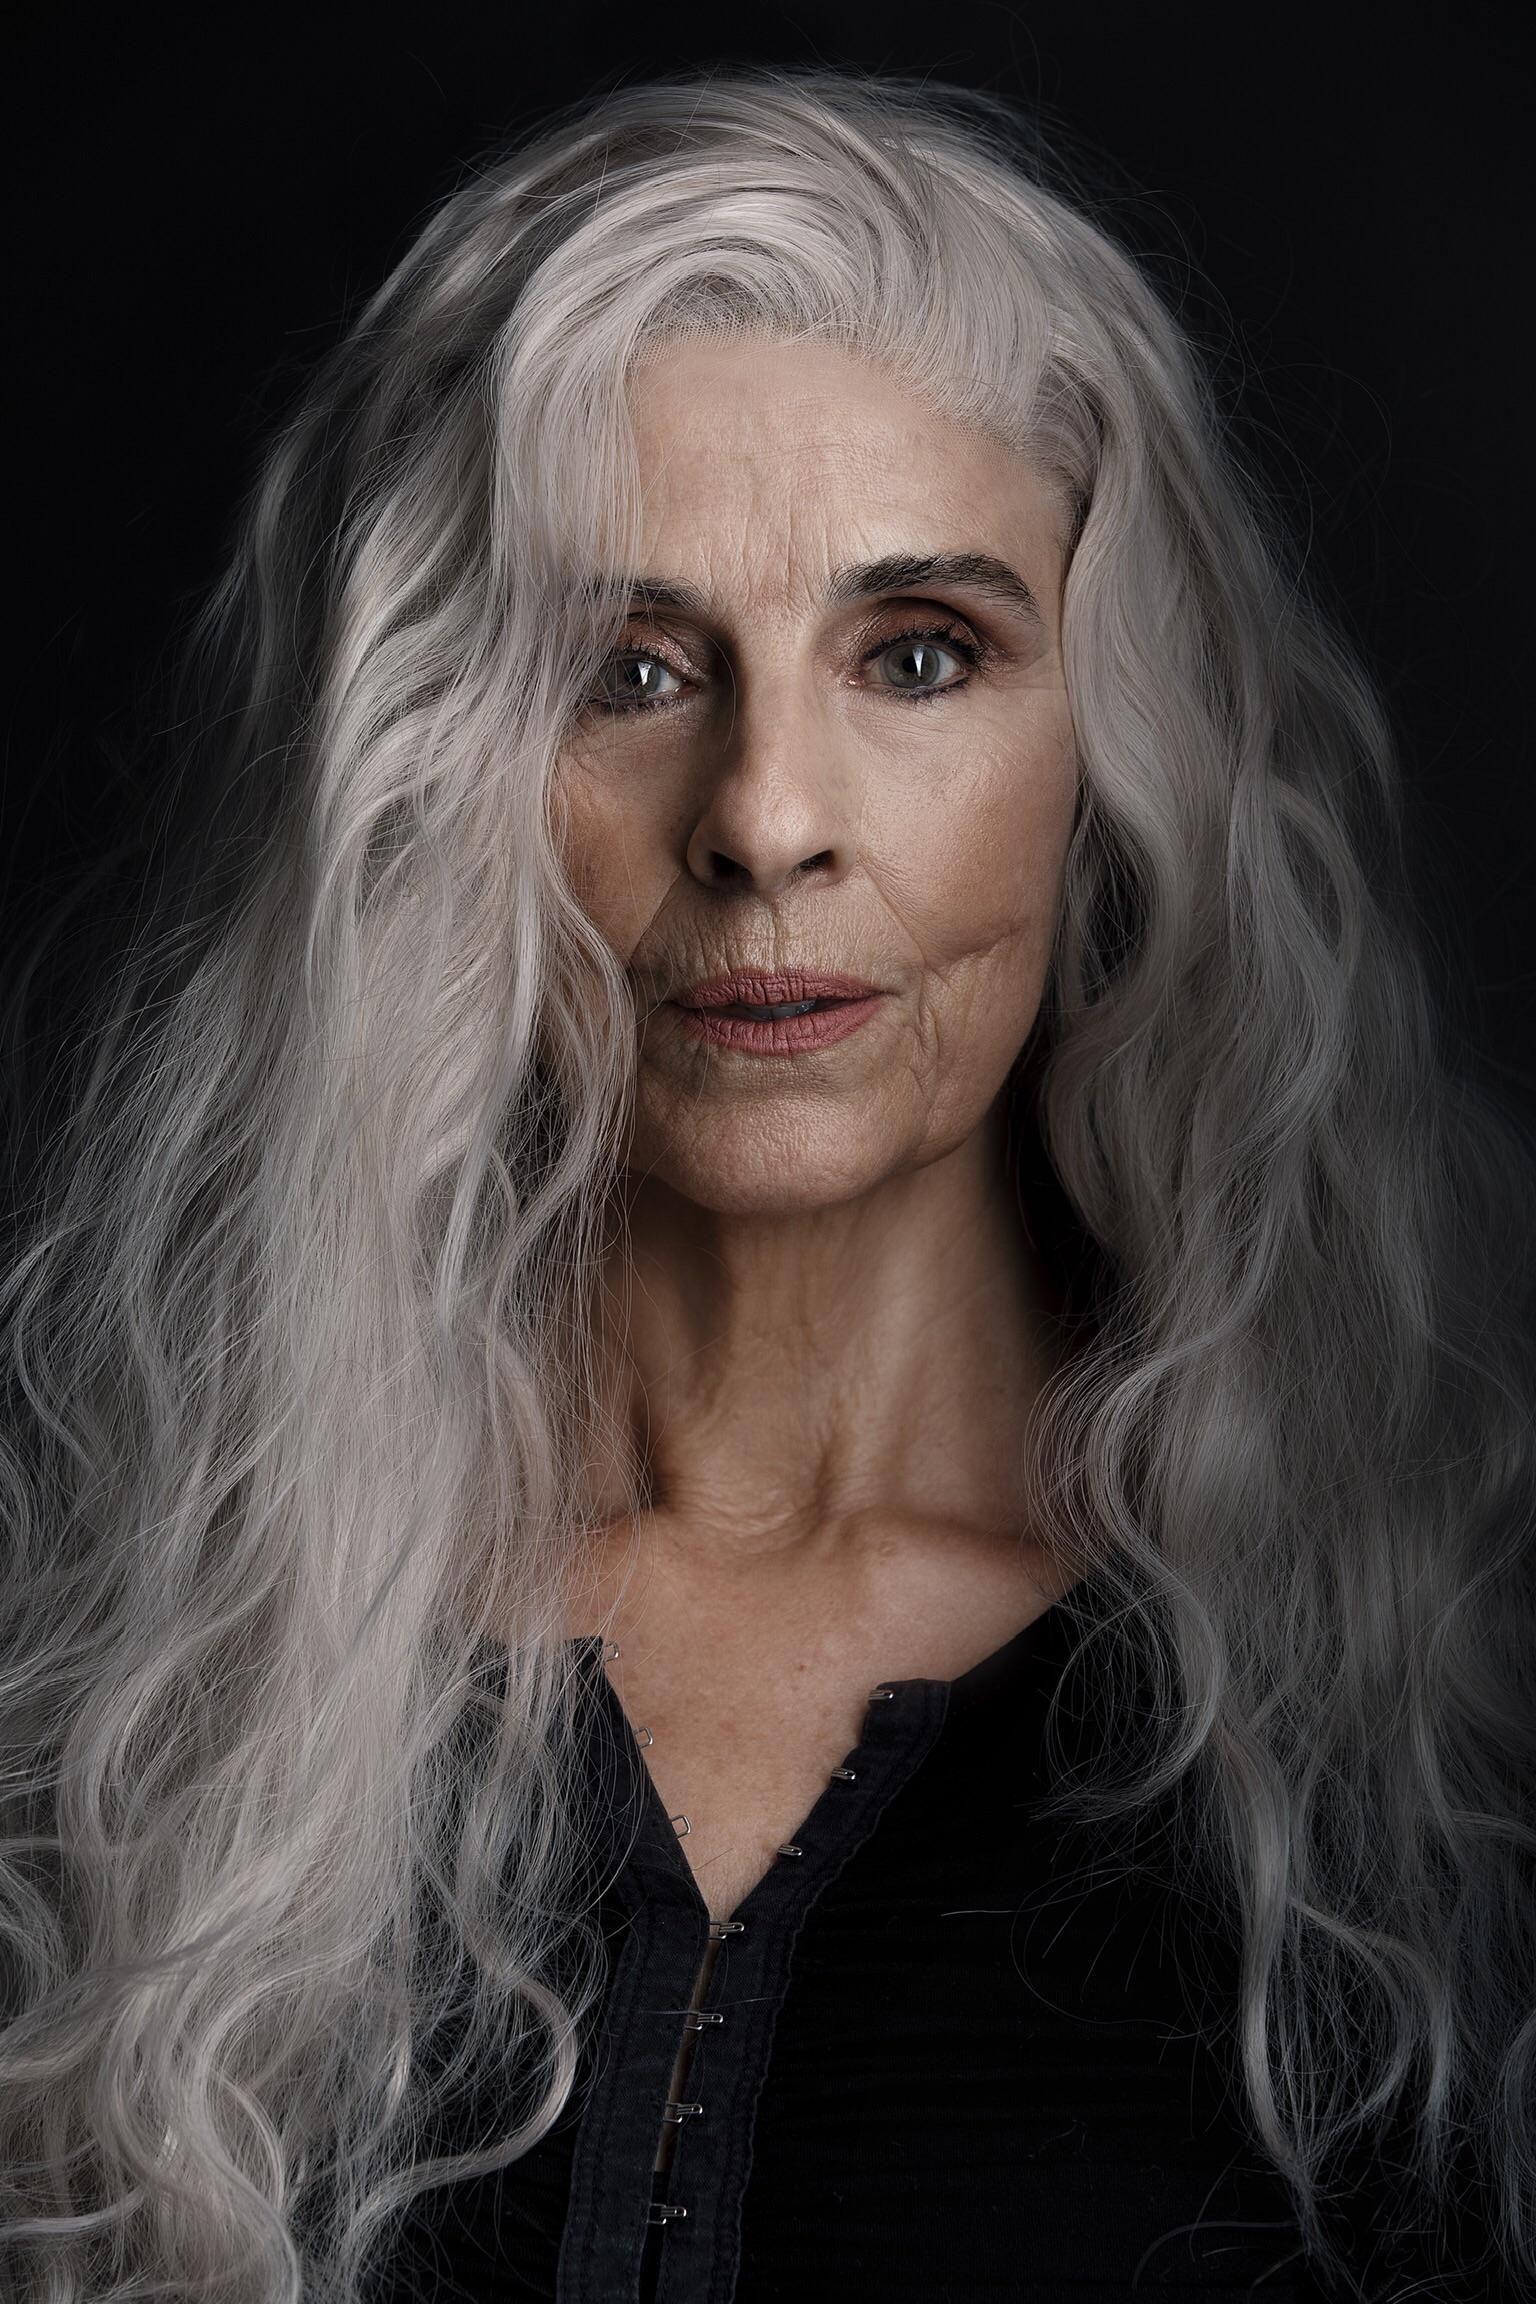 I took a photo of an older lady, shes an aspiring actress